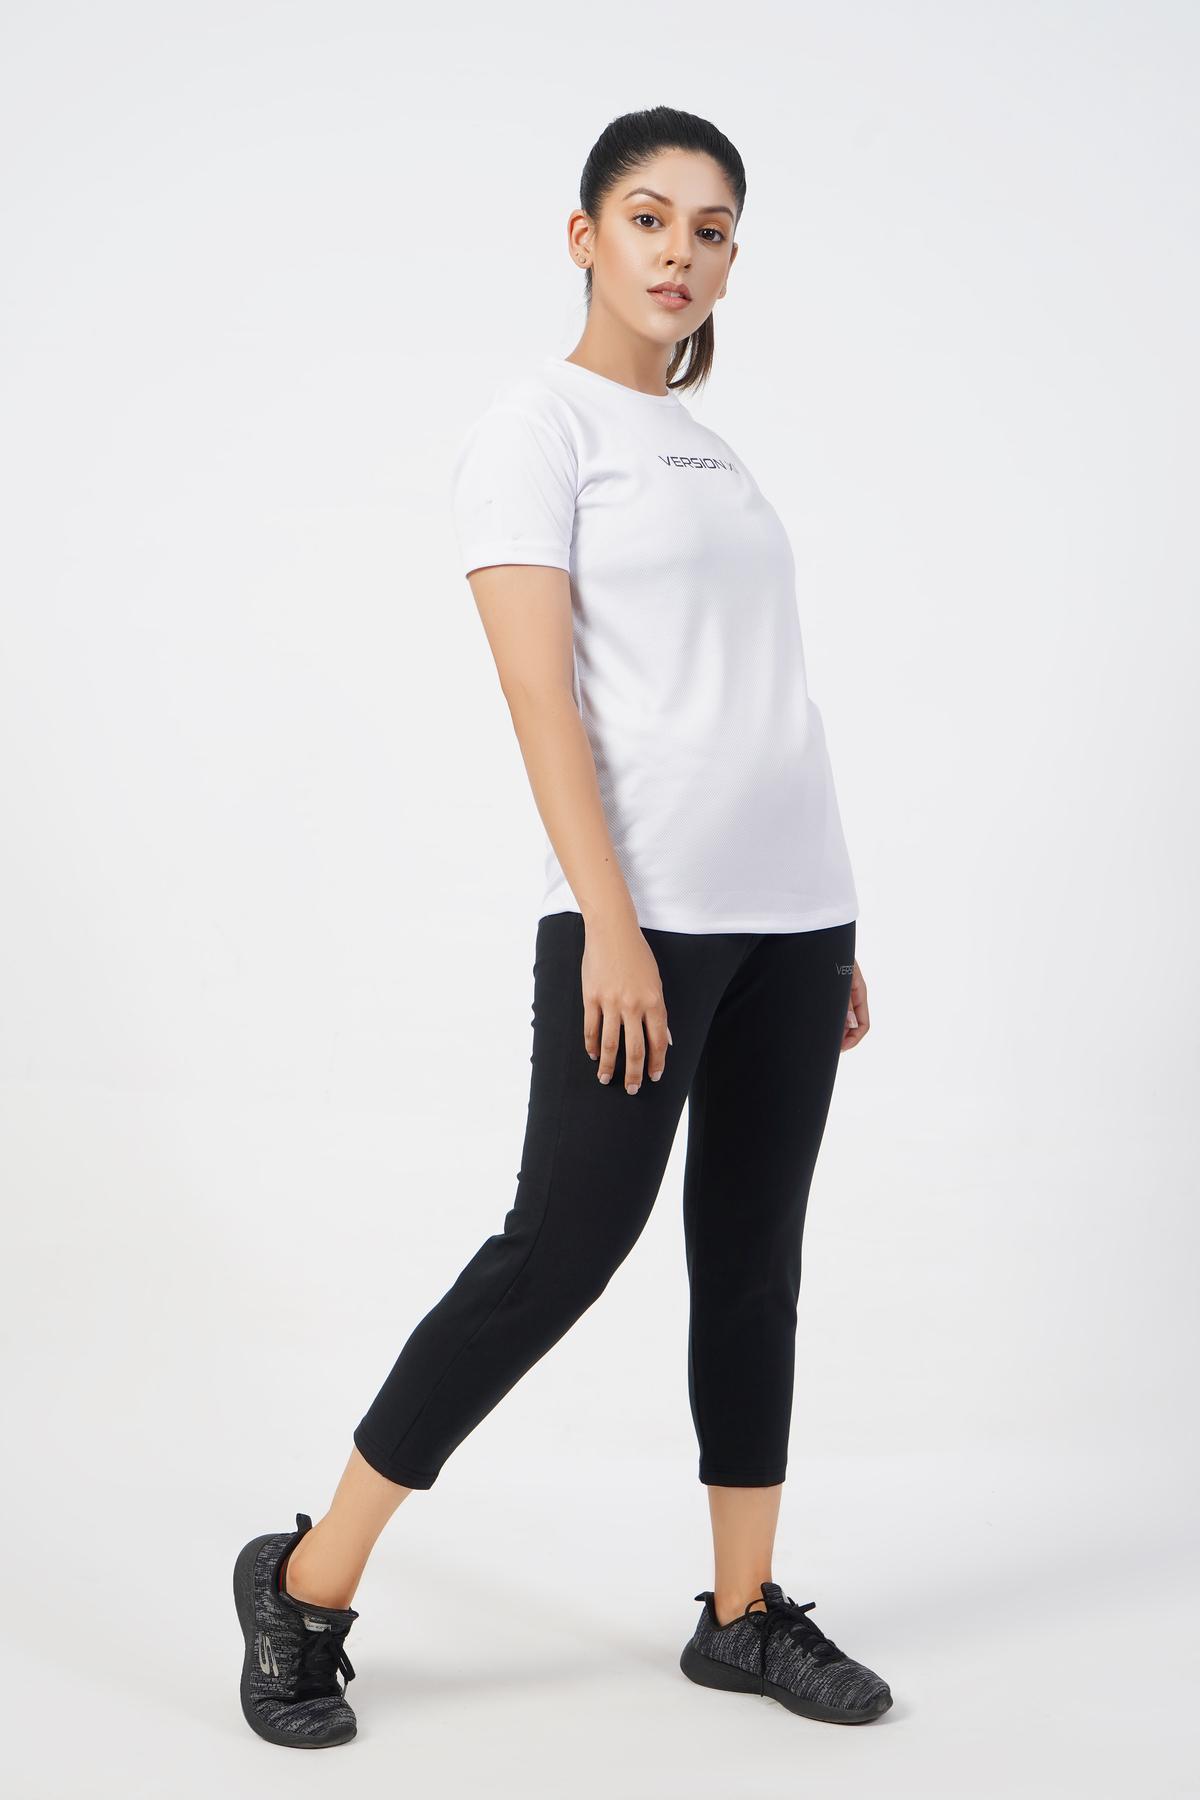 Vital Micro Mesh White T-Shirt Women